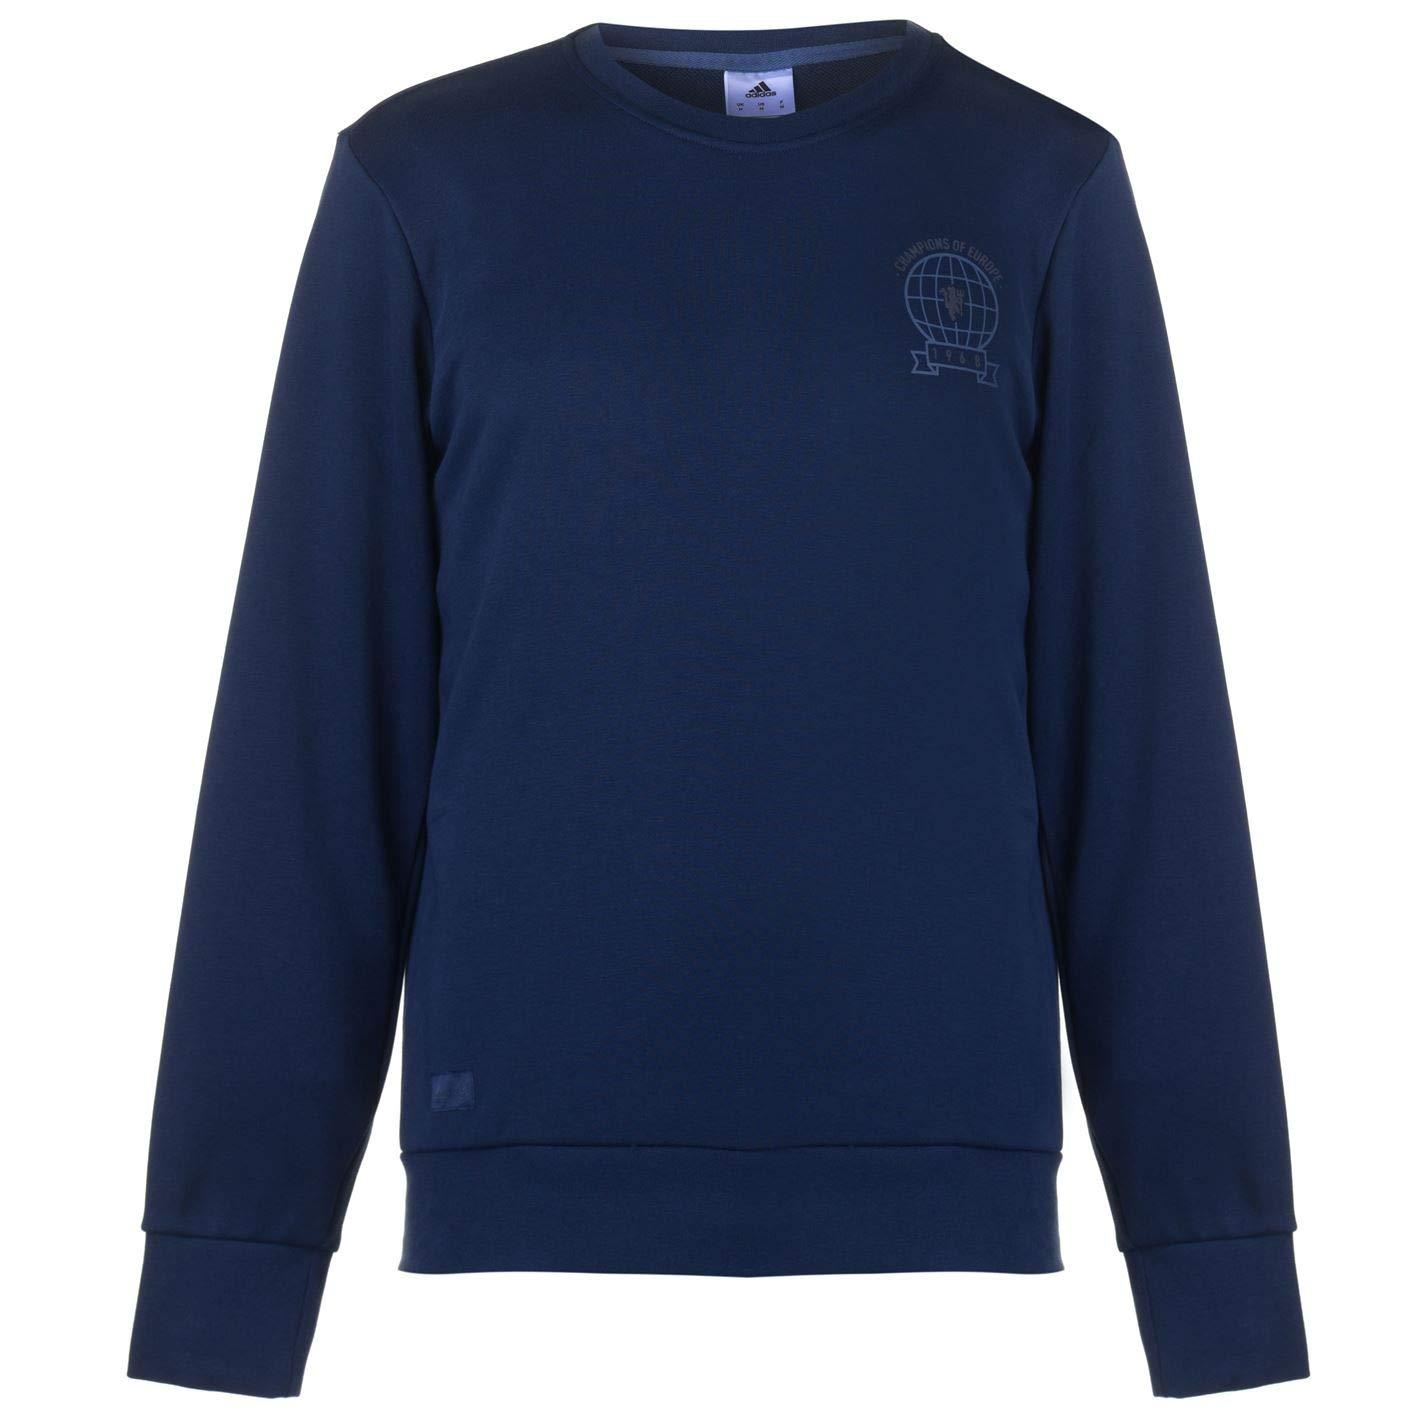 Adidas Herren Manchester United Graphic Sweat Top Sweatshirt